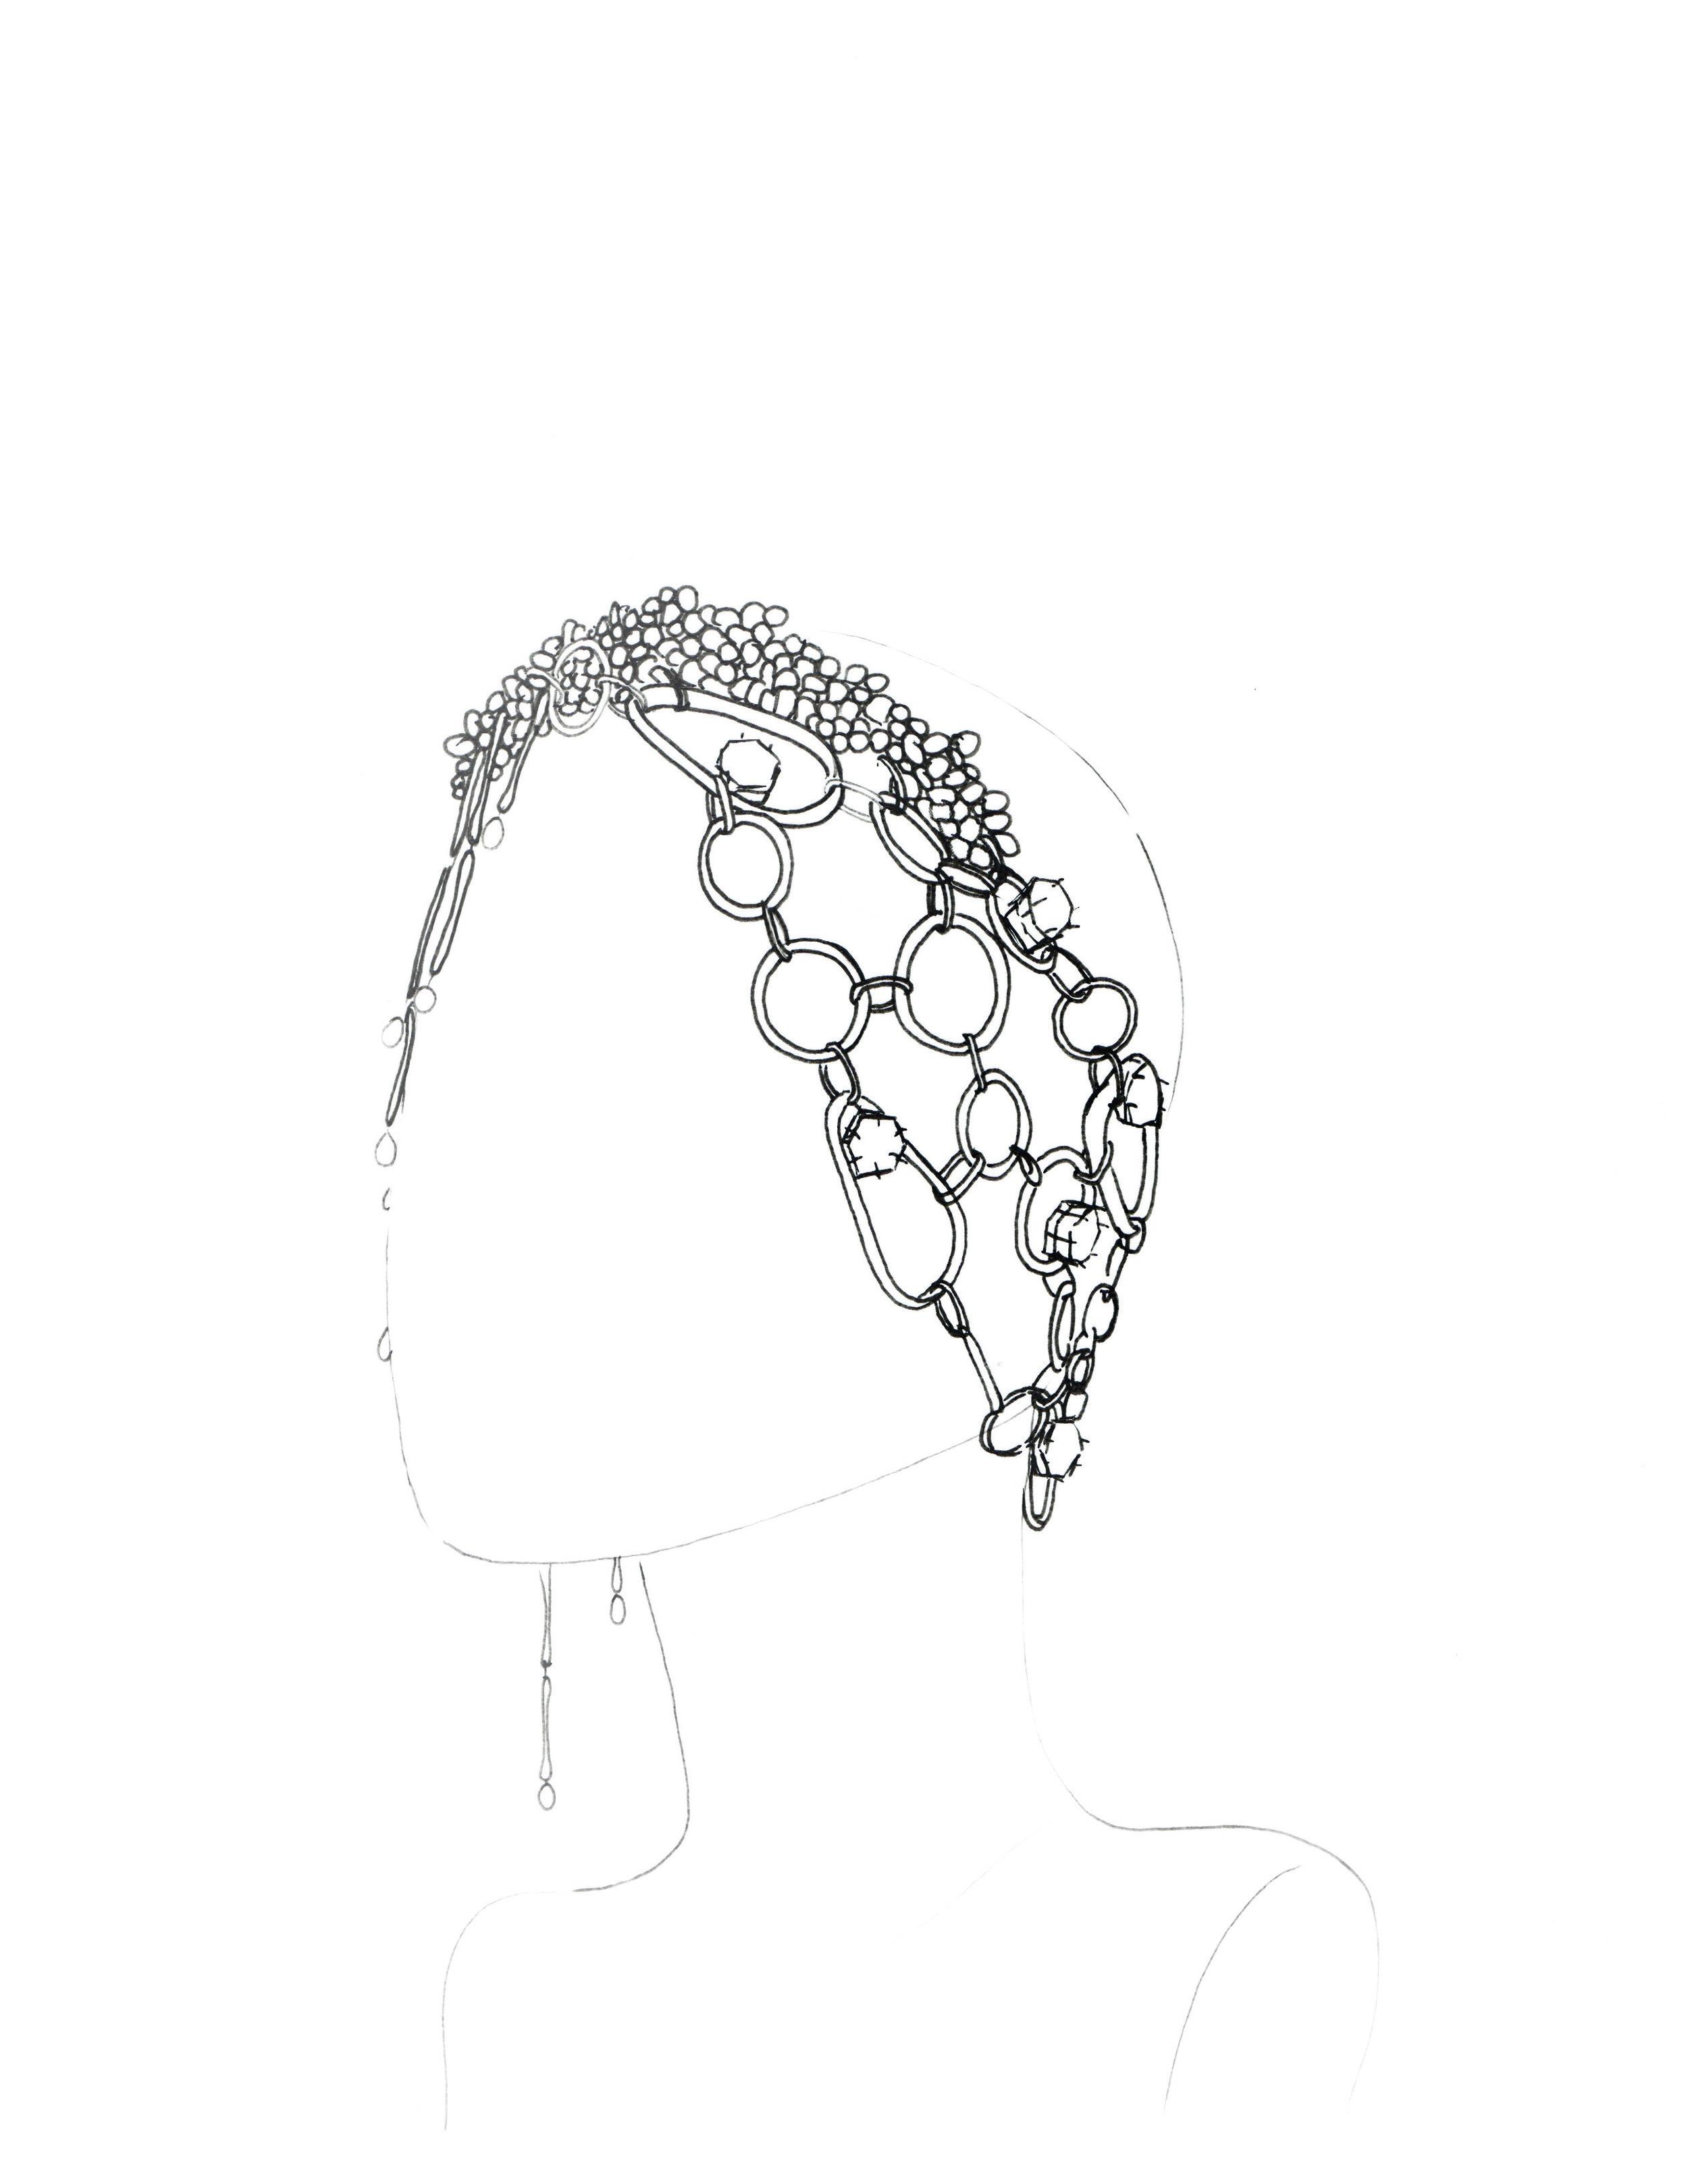 Swanson_Sarah_Final Sketch